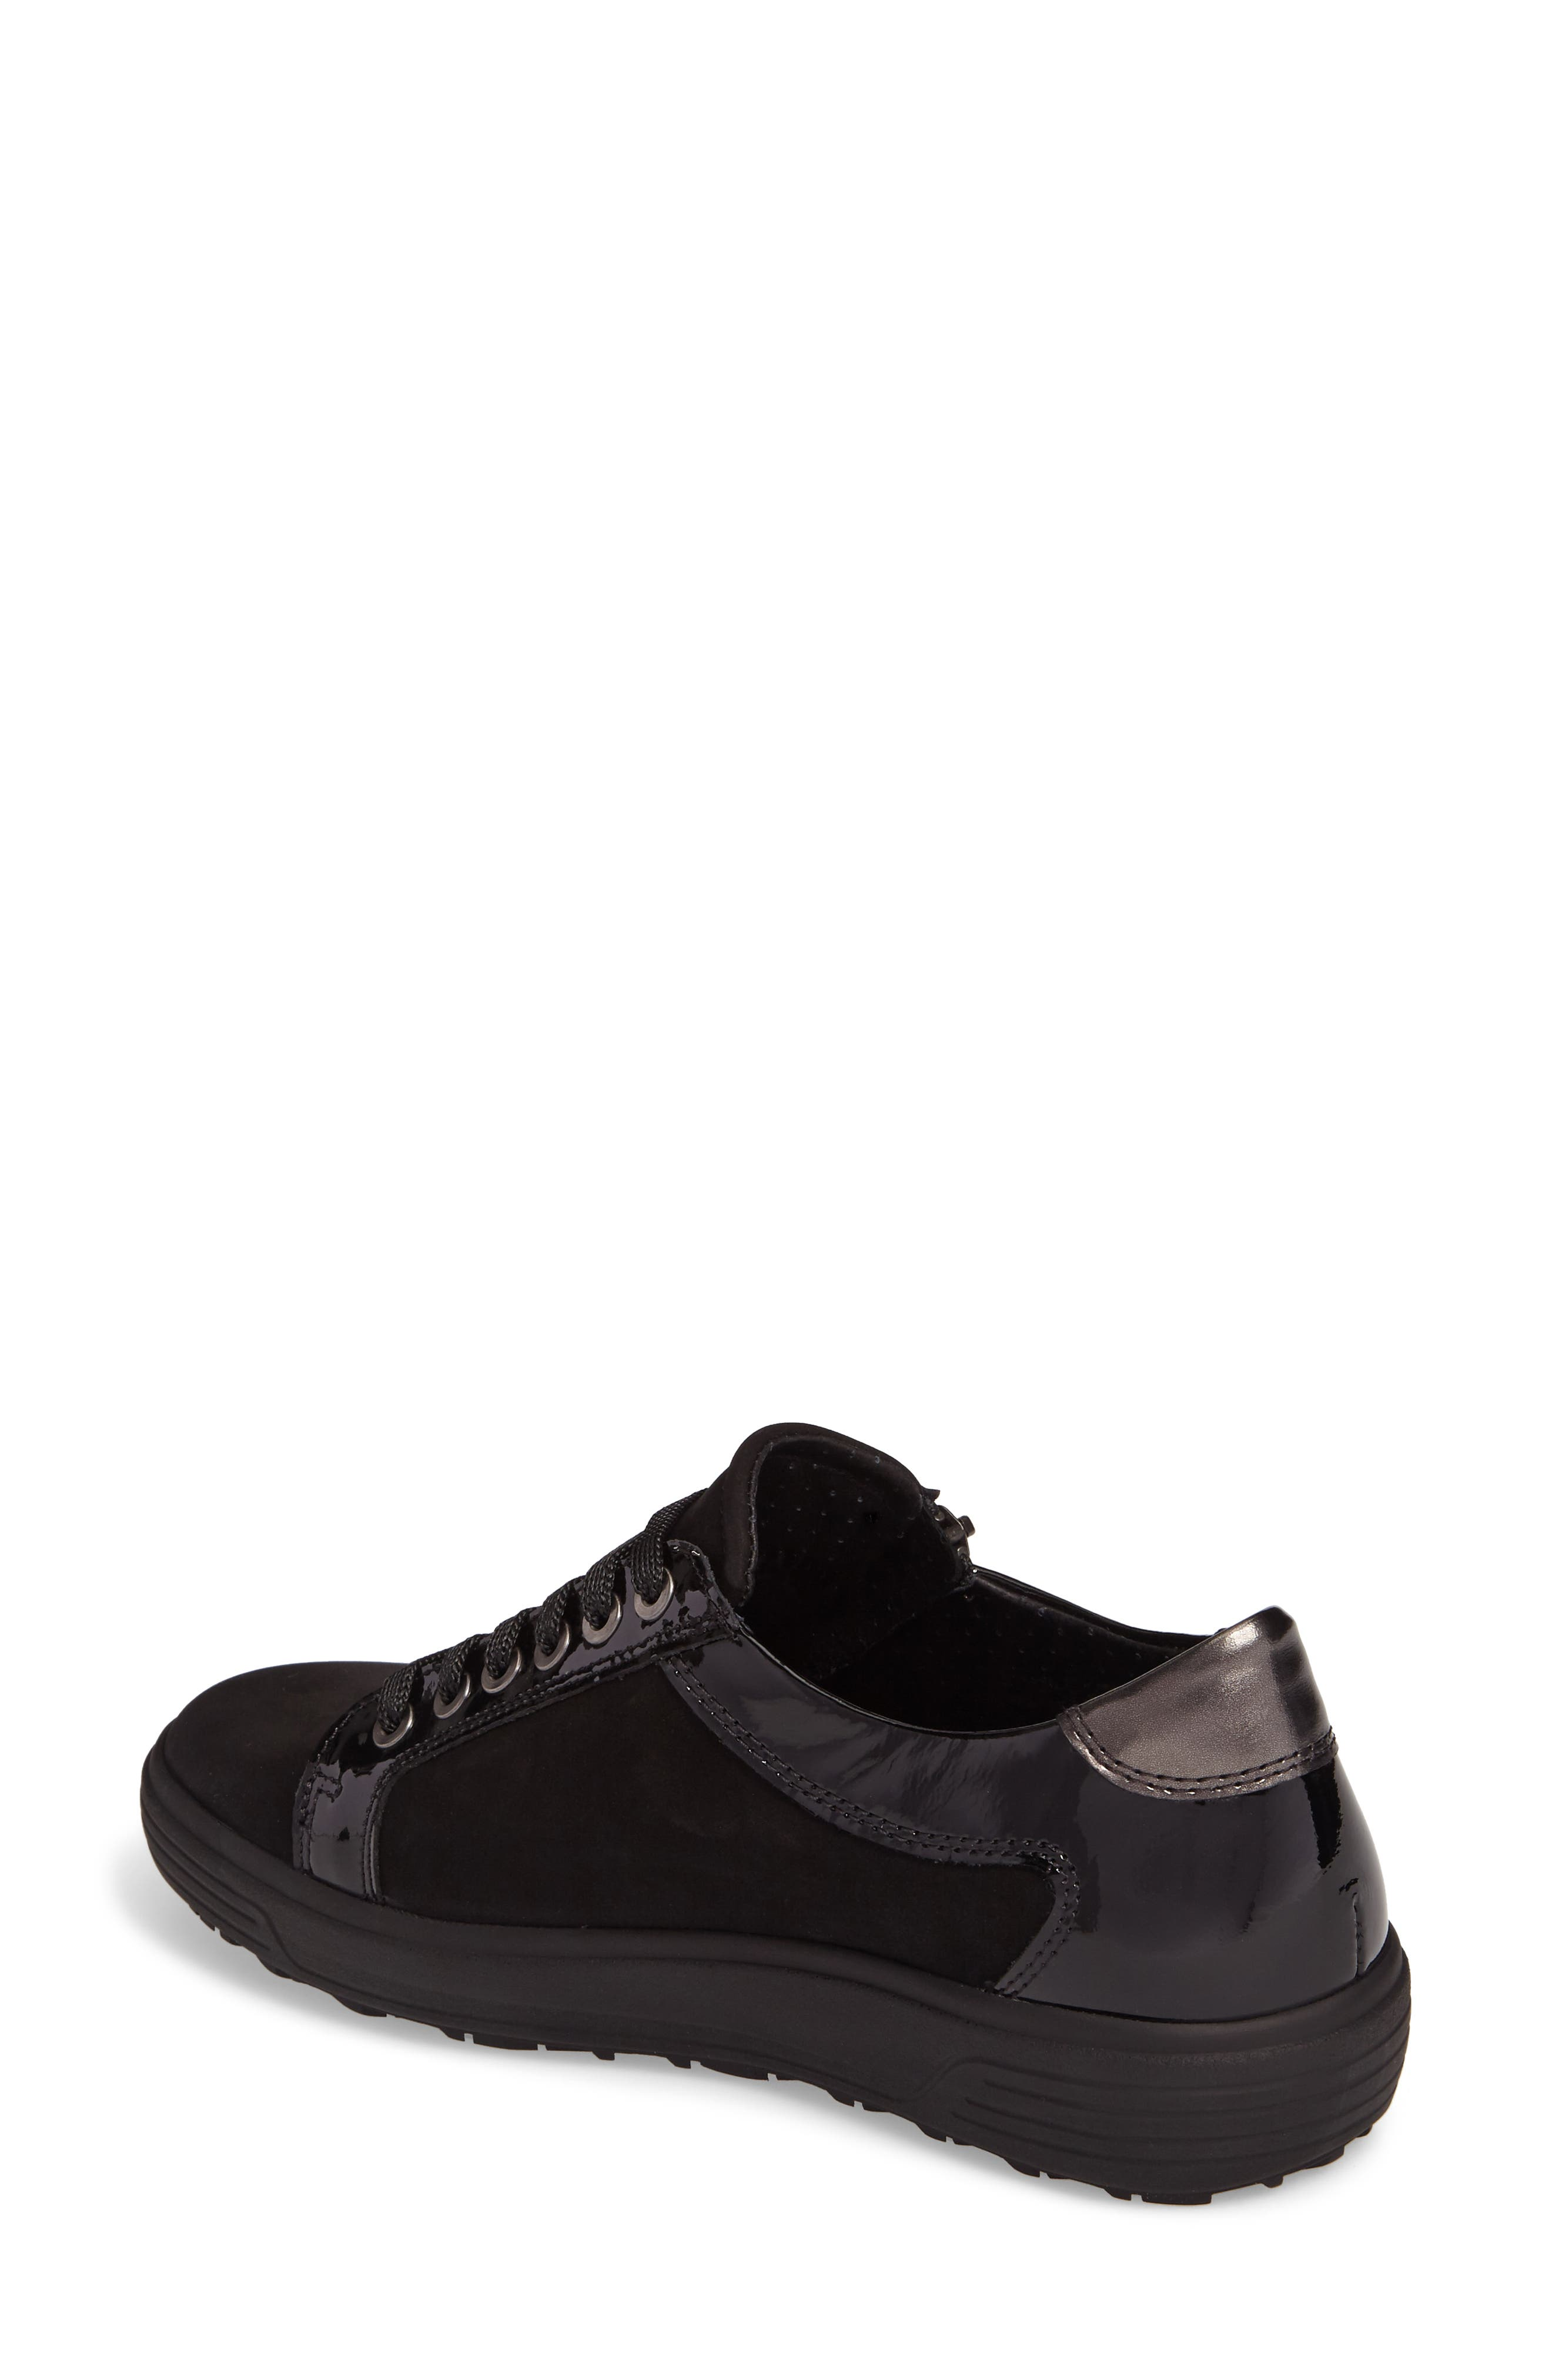 Lenza Sneaker,                             Alternate thumbnail 2, color,                             012